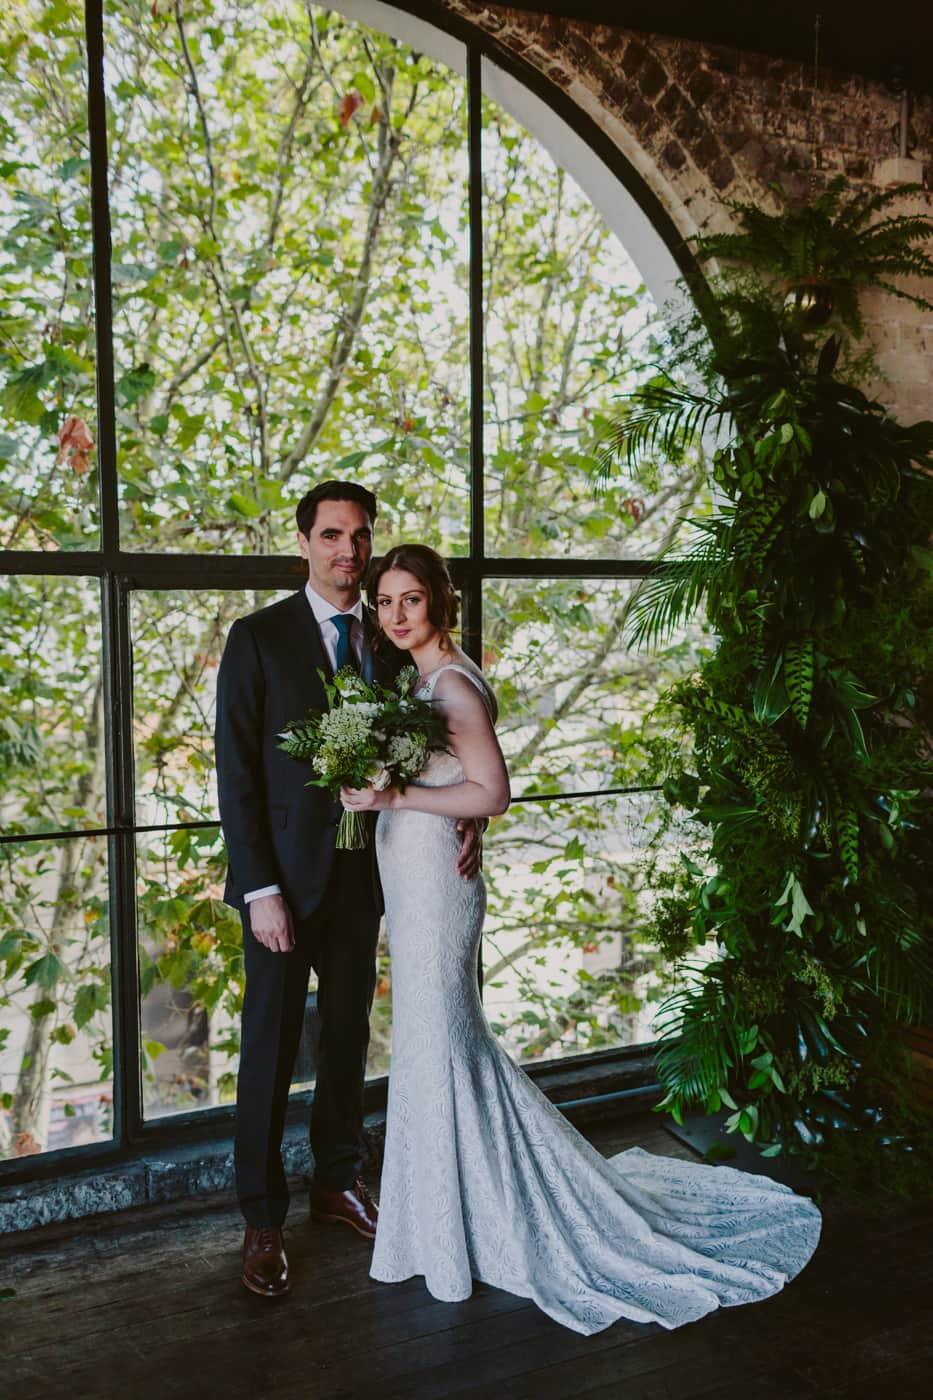 Paul++Laura-236-min.jpg